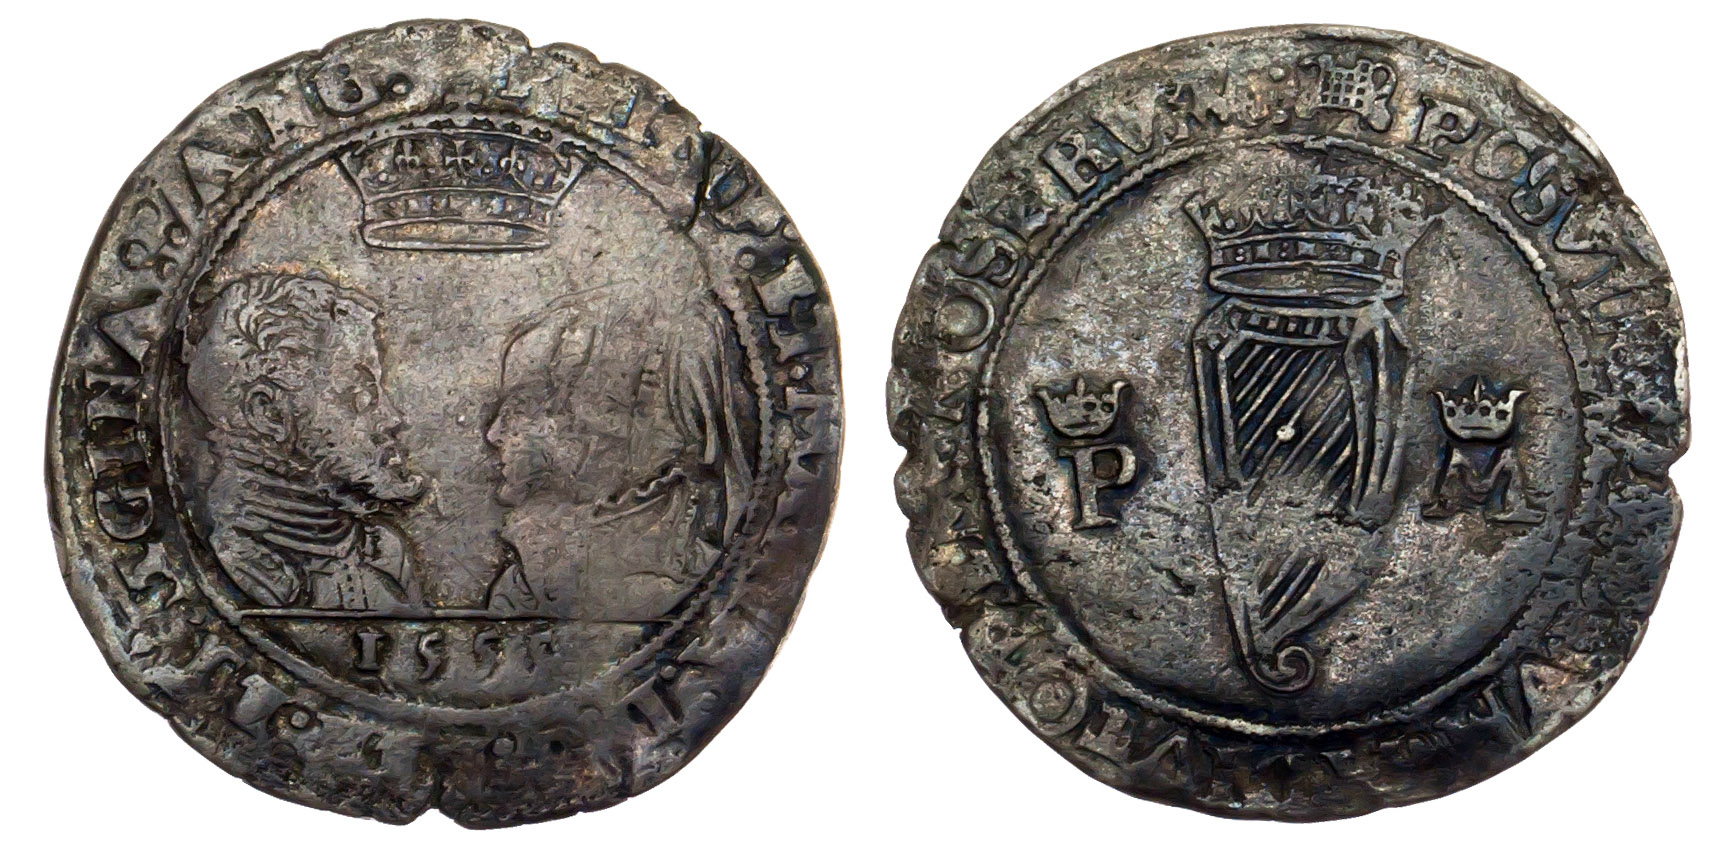 Ireland, Philip & Mary, silver Shilling, 1555